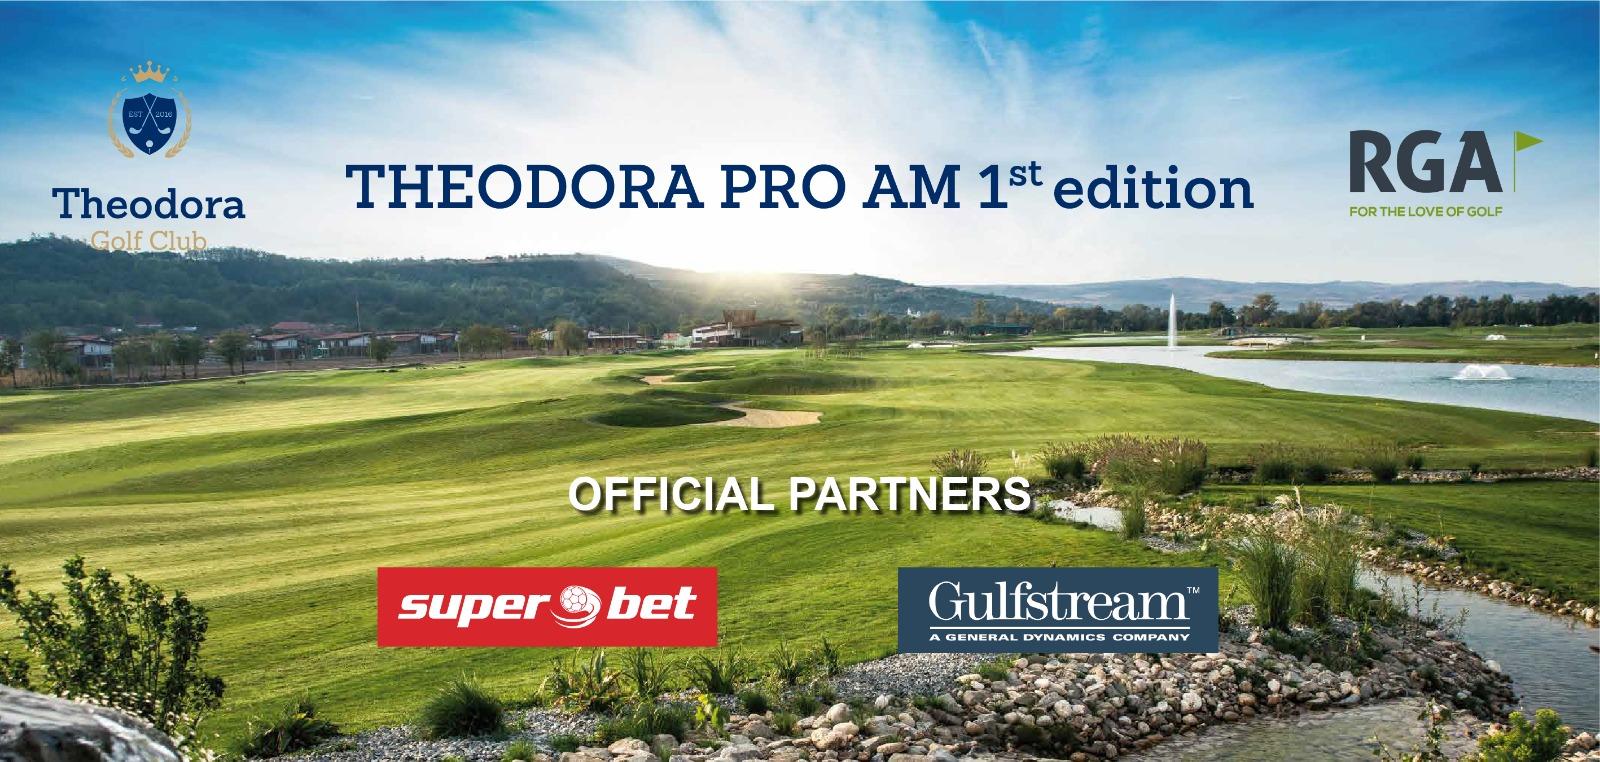 Primul turneu la nivel internațional  PRO AM din România va avea loc pe 17-20 iulie la Theodora Golf Club